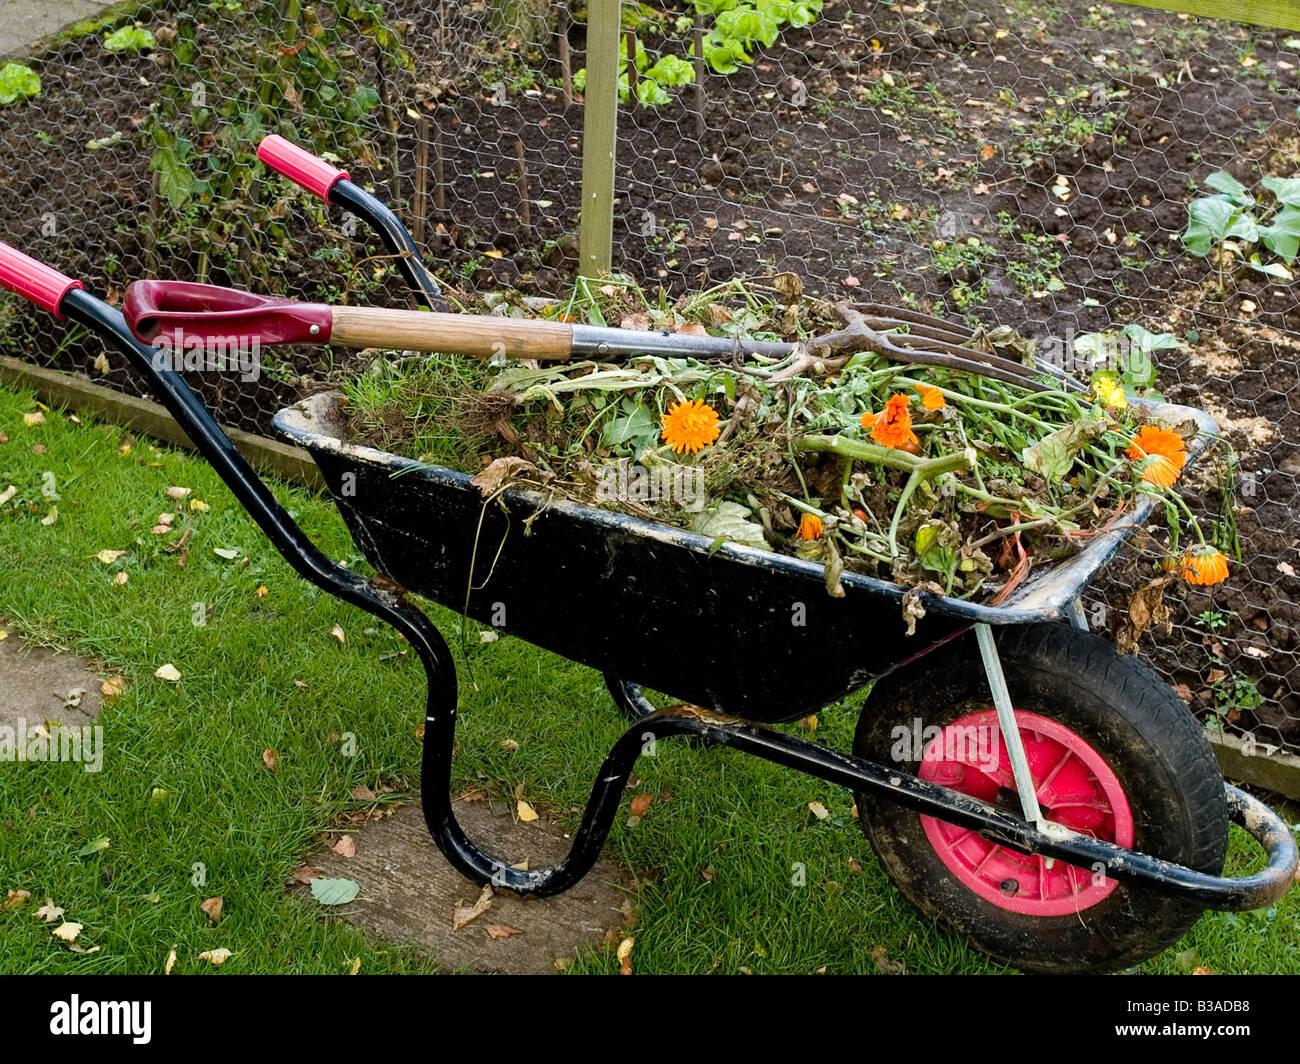 Wheelbarrow With Weeds Garden Gardening   Stock Image